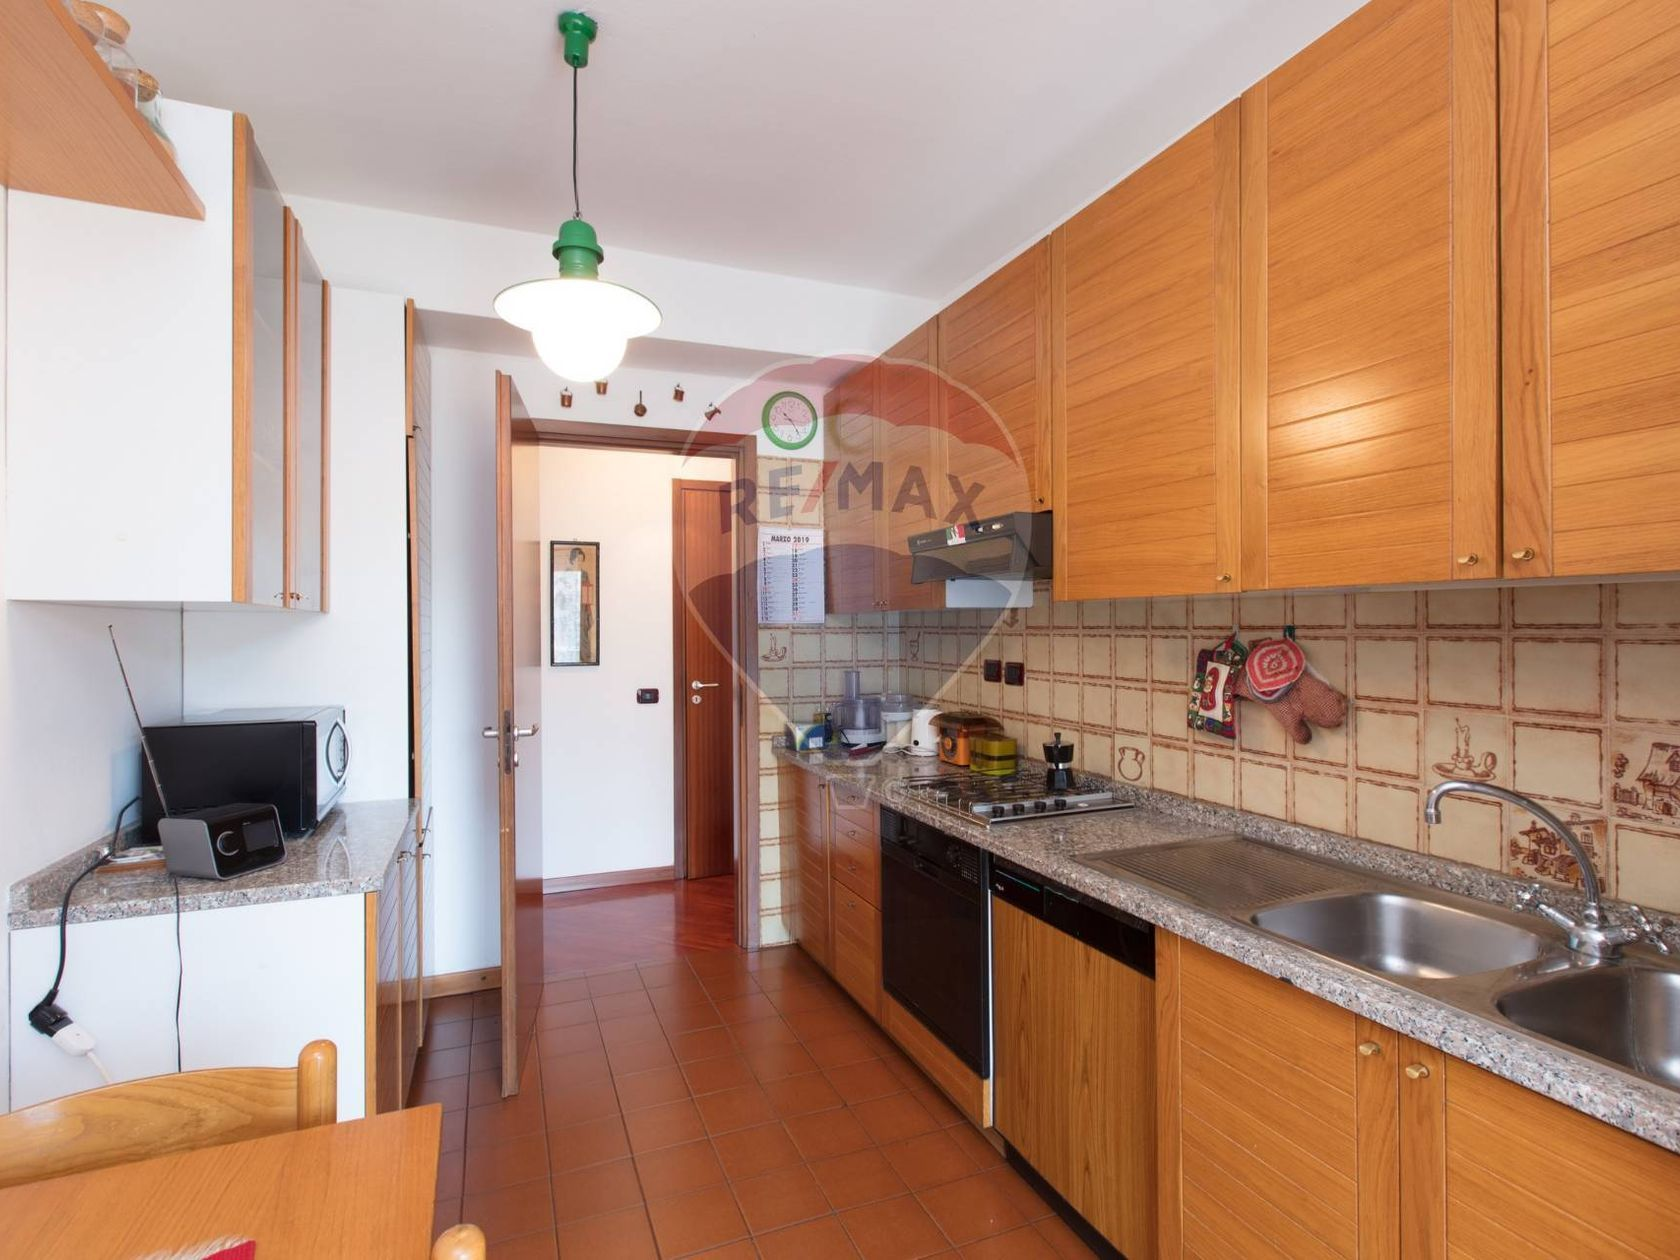 Appartamento Zona Esselunga, Rho, MI Vendita - Foto 8